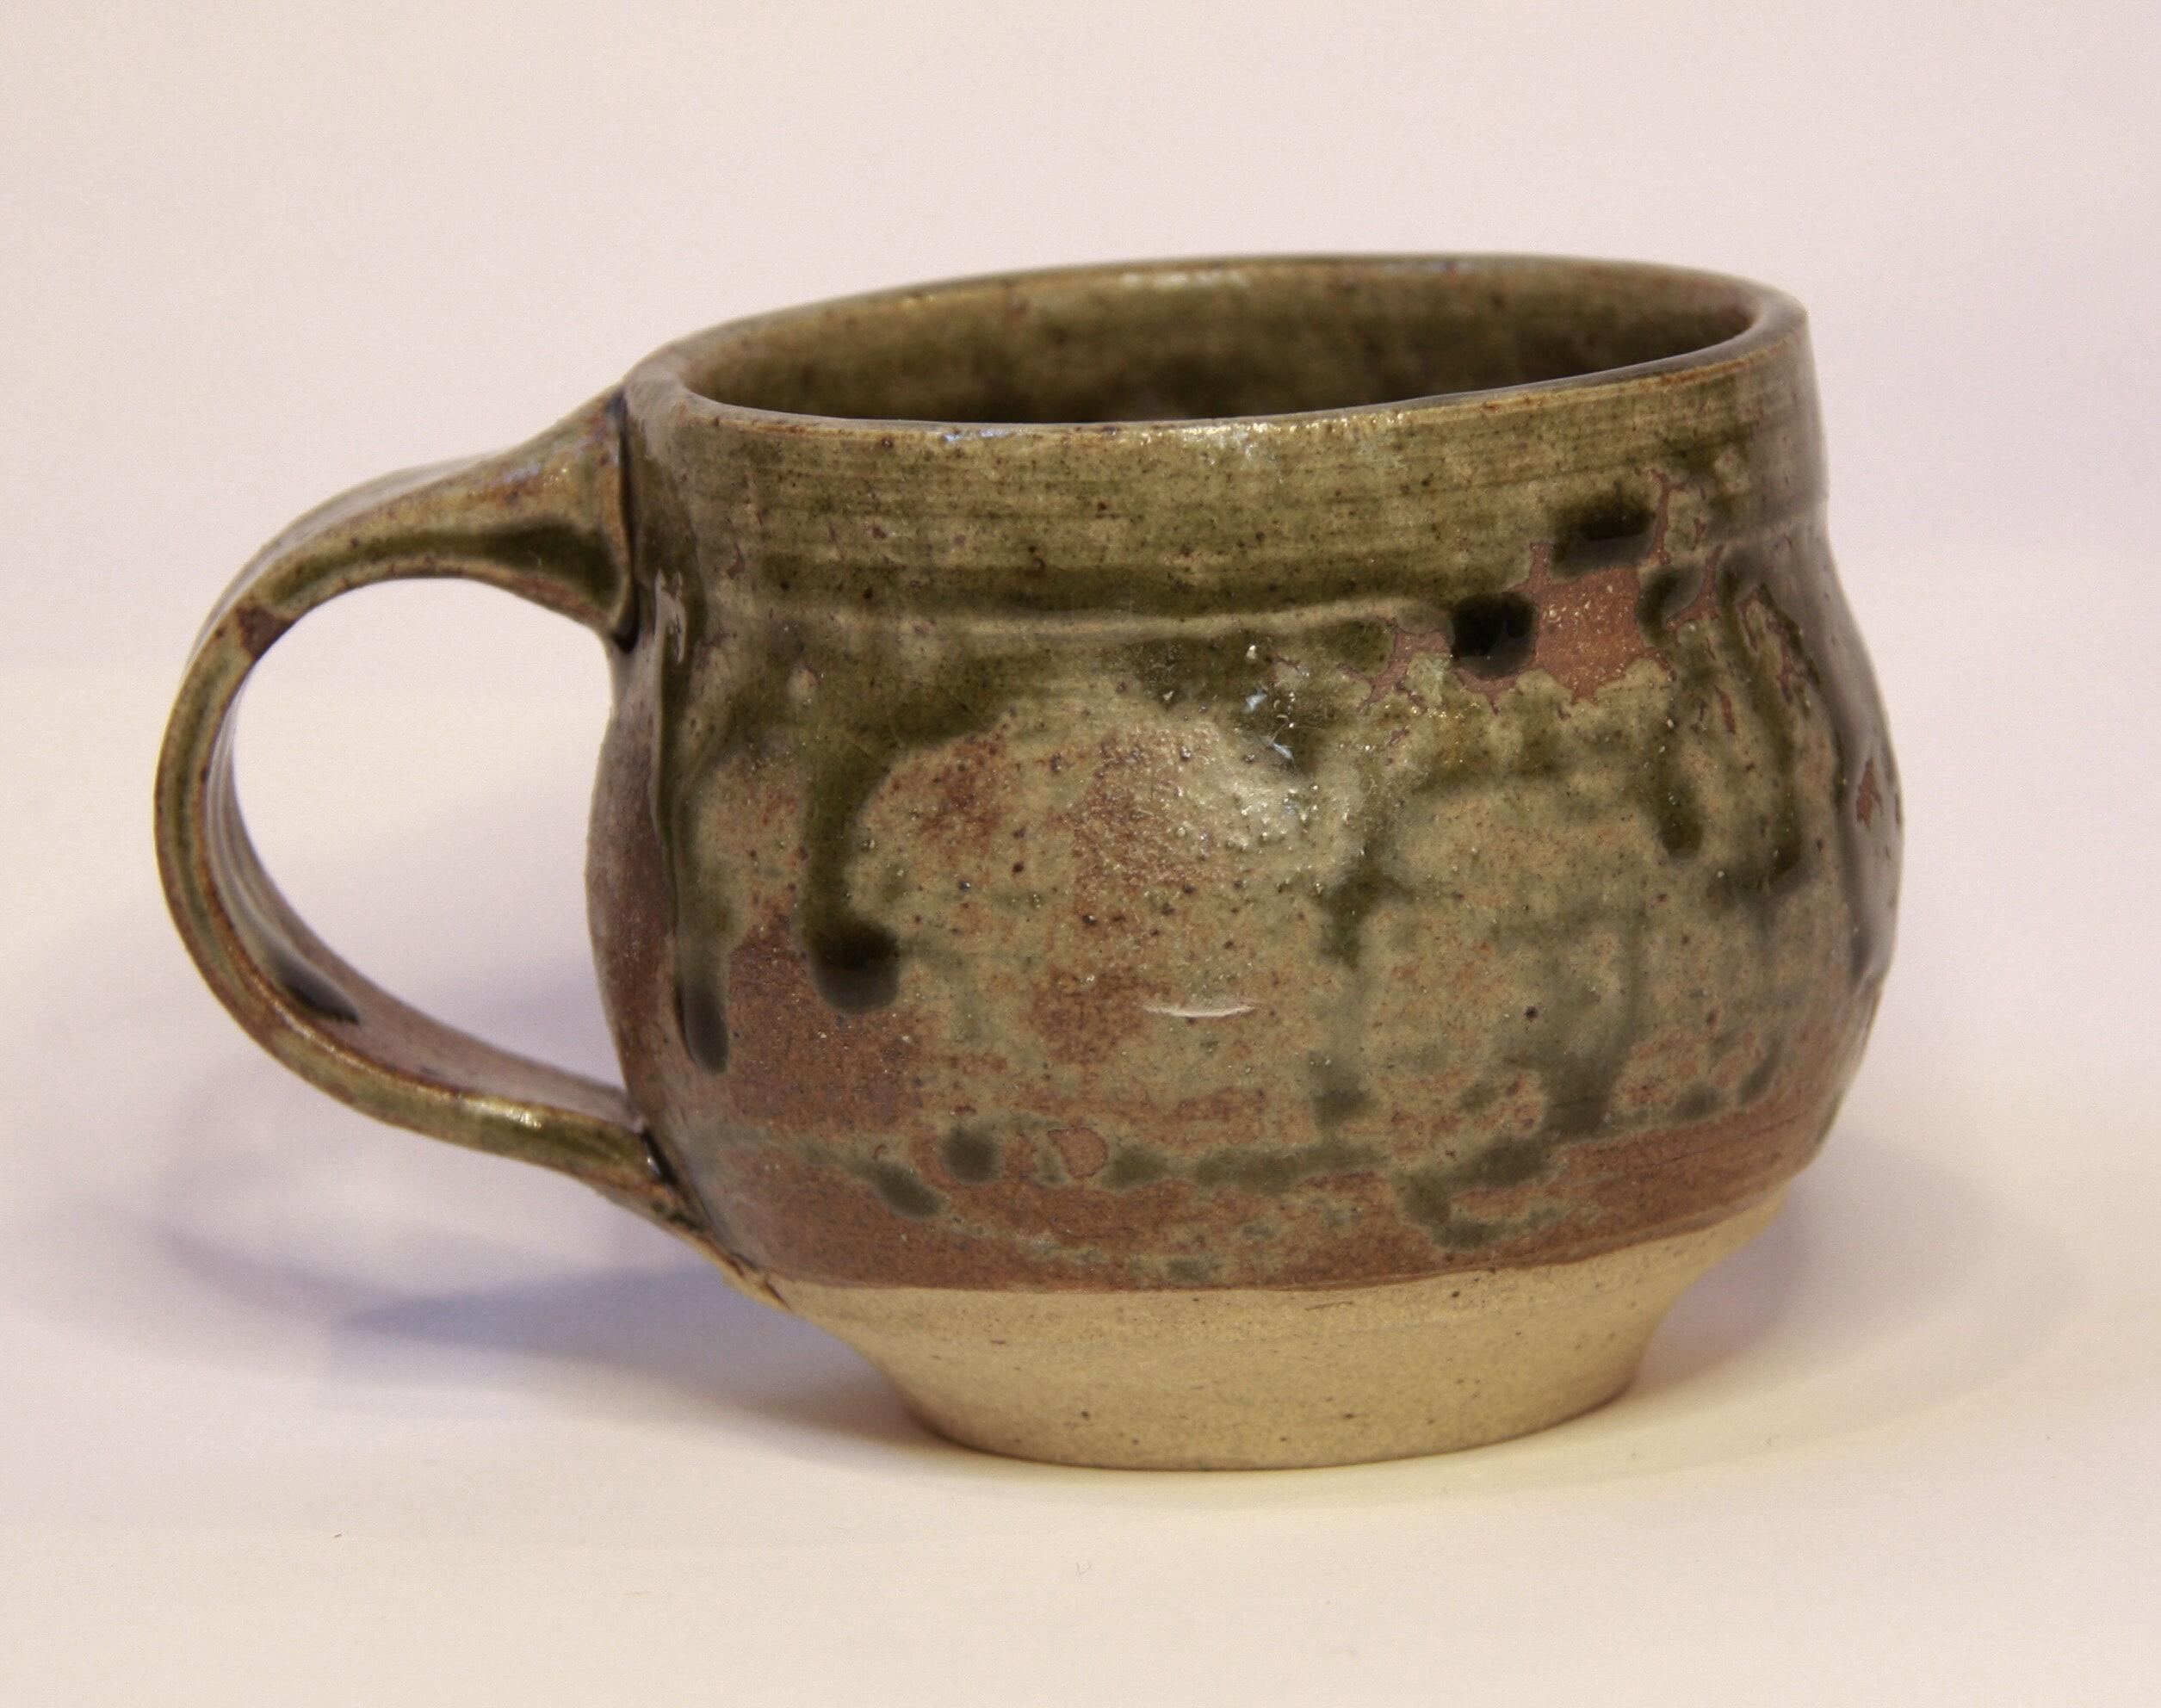 Small cup with mulga and lilli pilli ash glaze